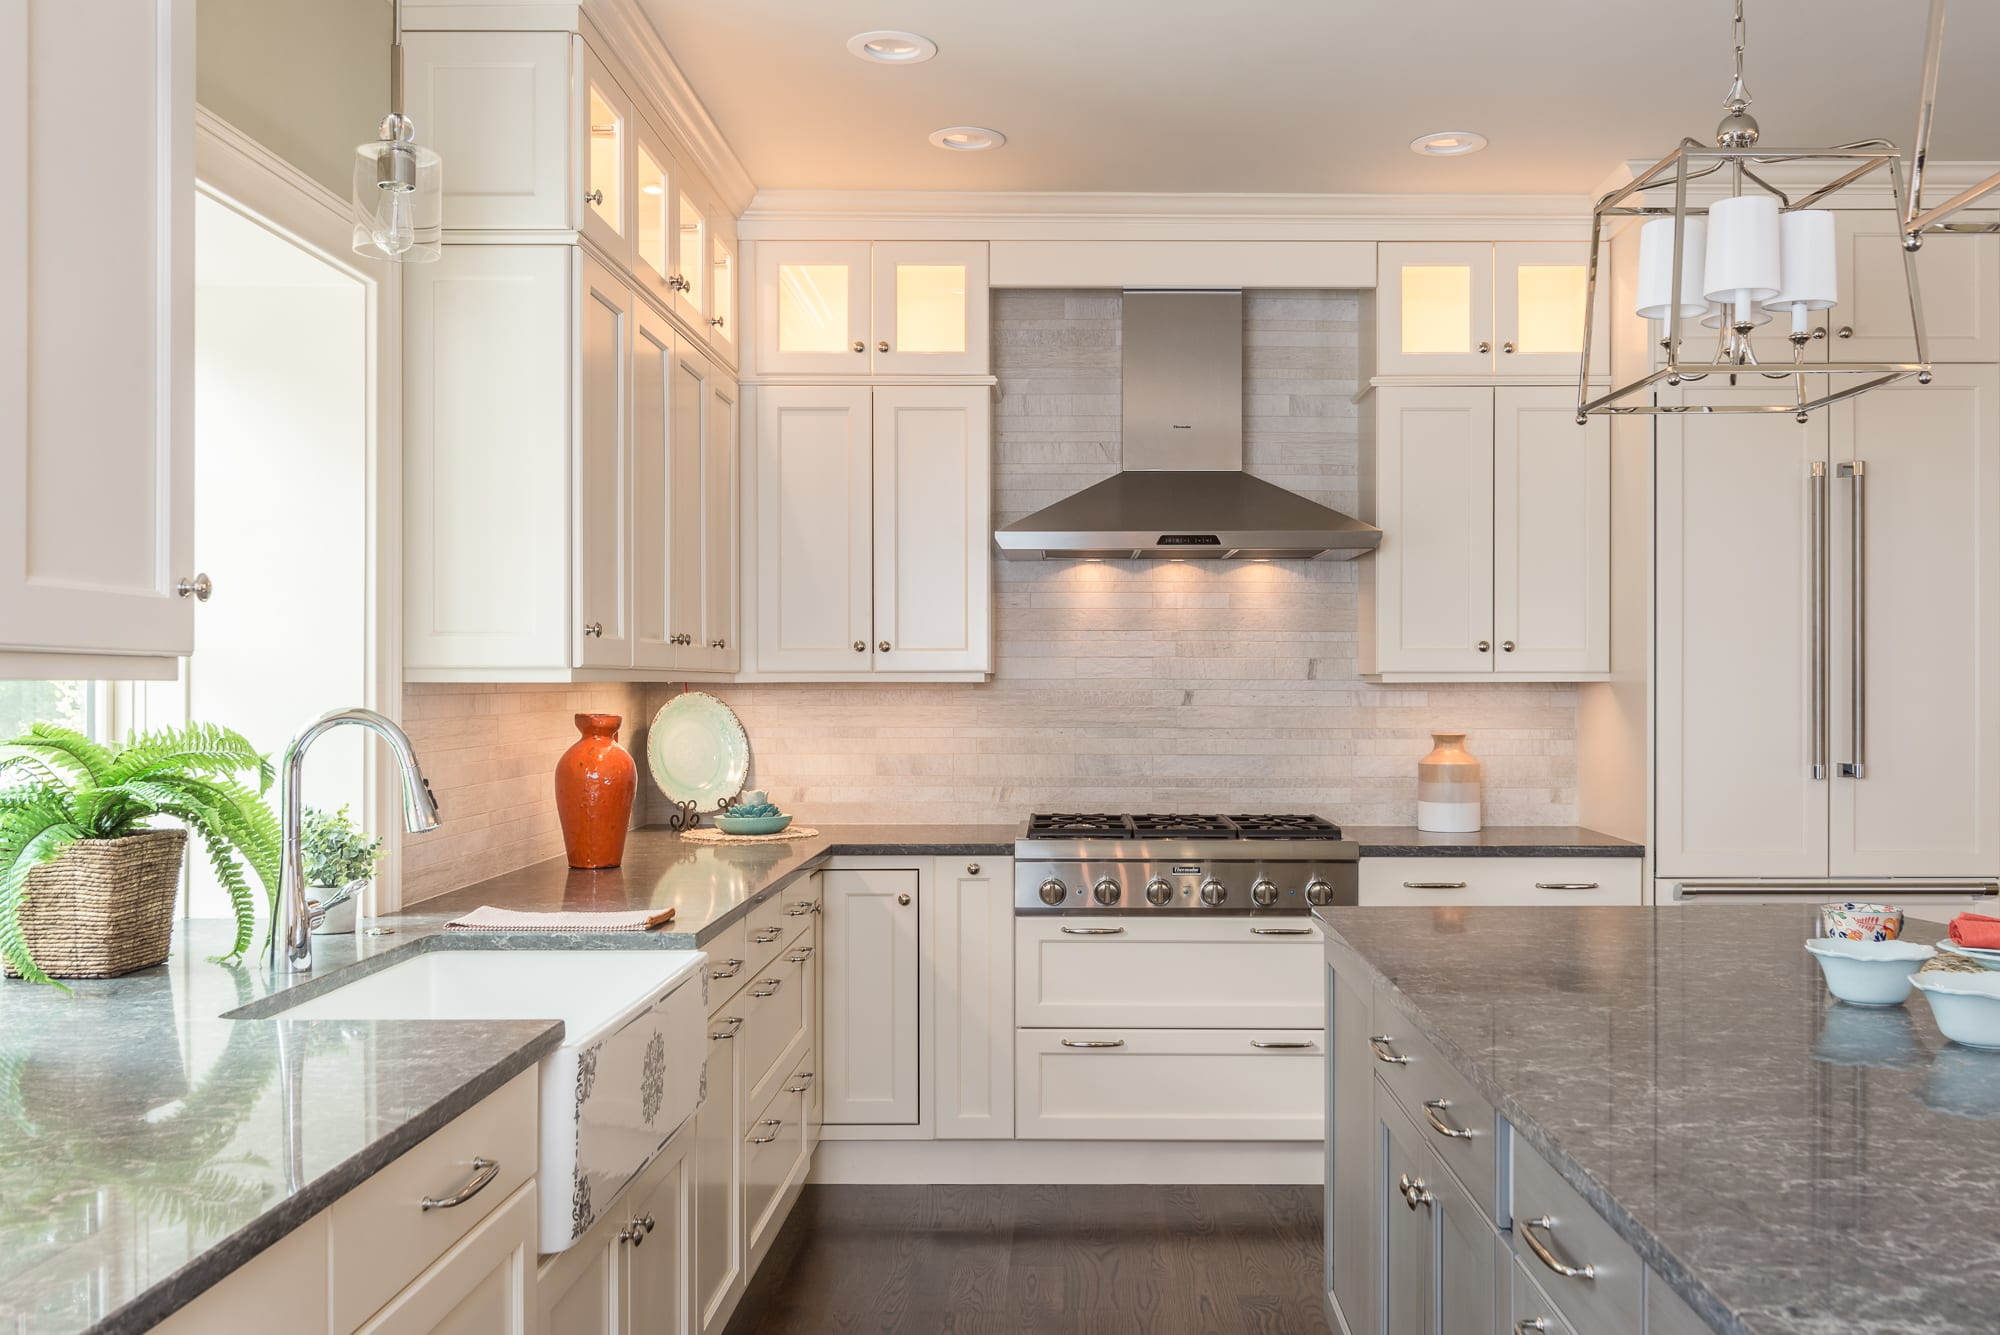 Kitchen Custom Light Fixtures and Interior Design